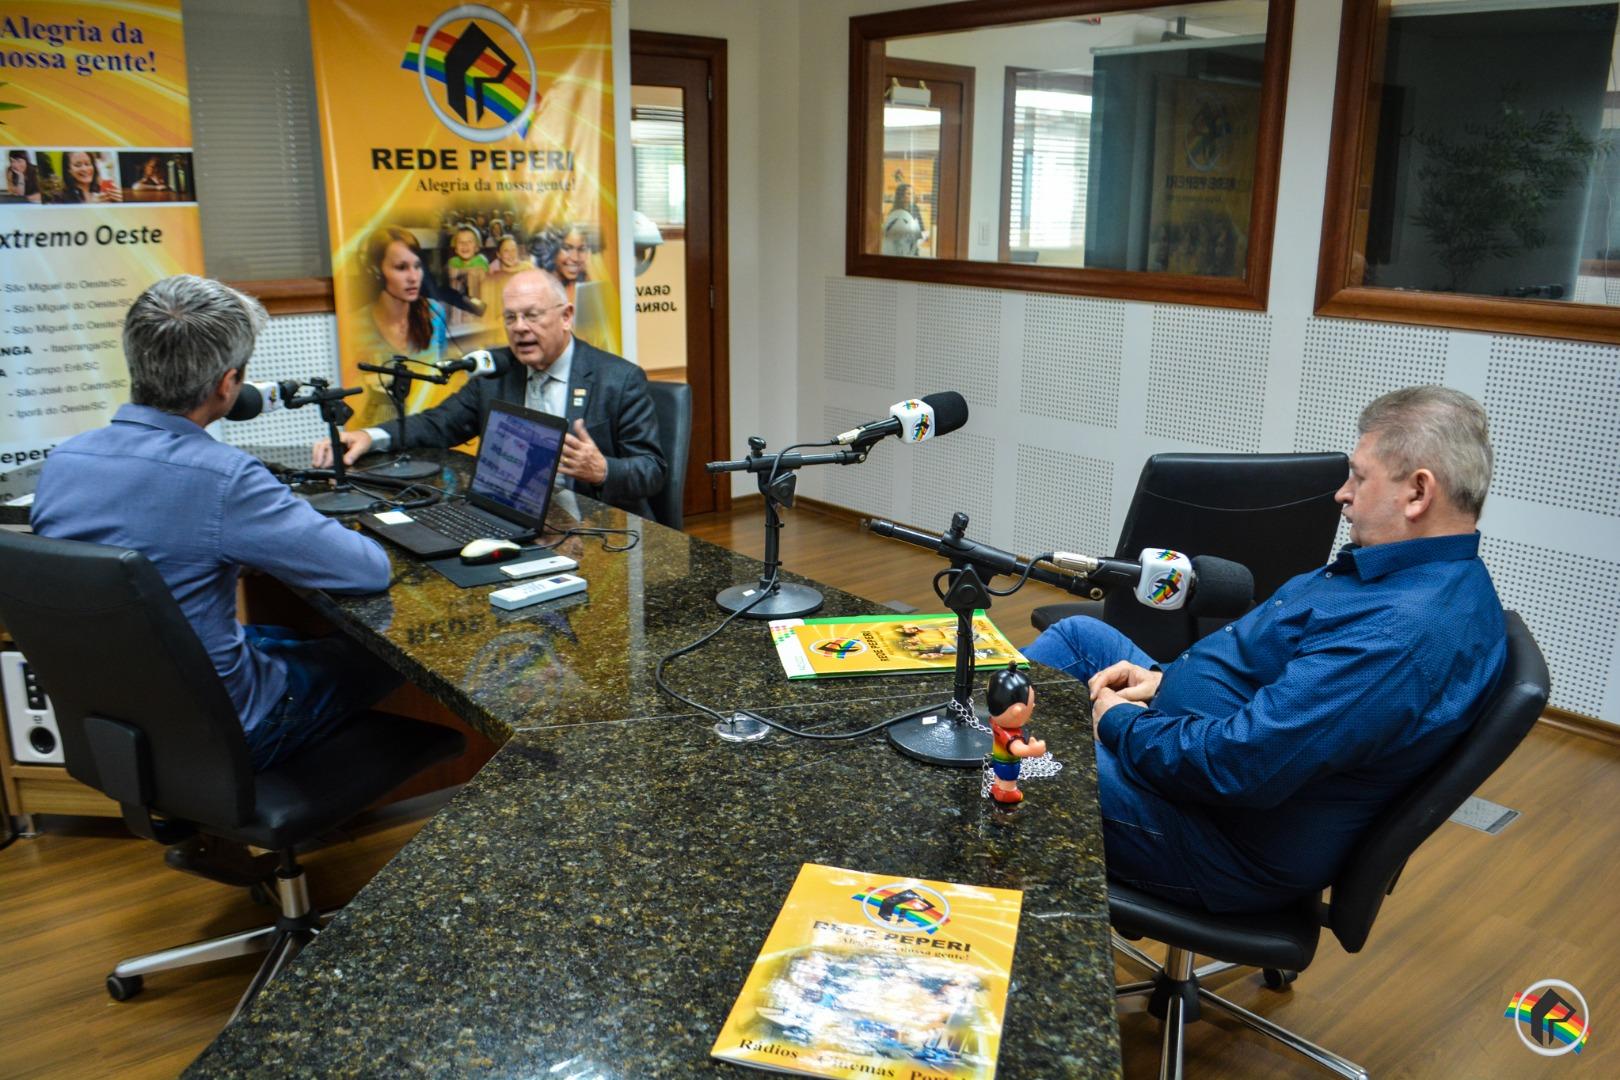 Cartilha Voz Única da Facisc é o assunto do Peperi Entrevista